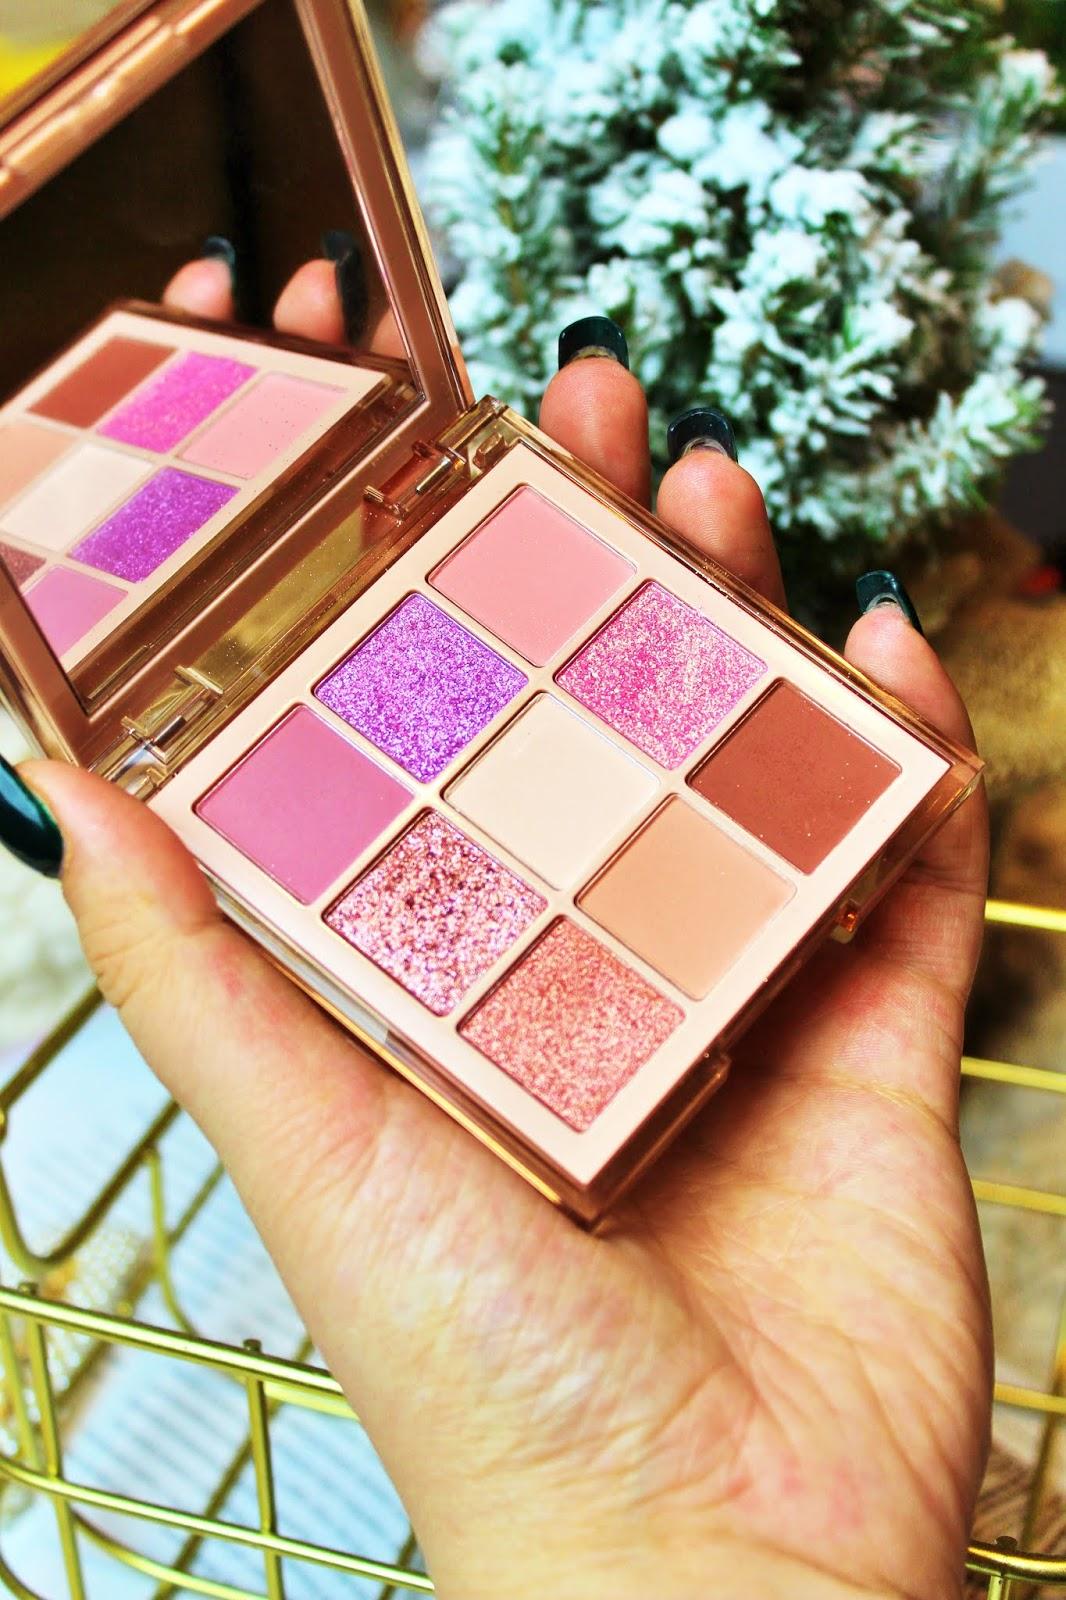 Huda beauty paleta - oferty Ceneo.pl